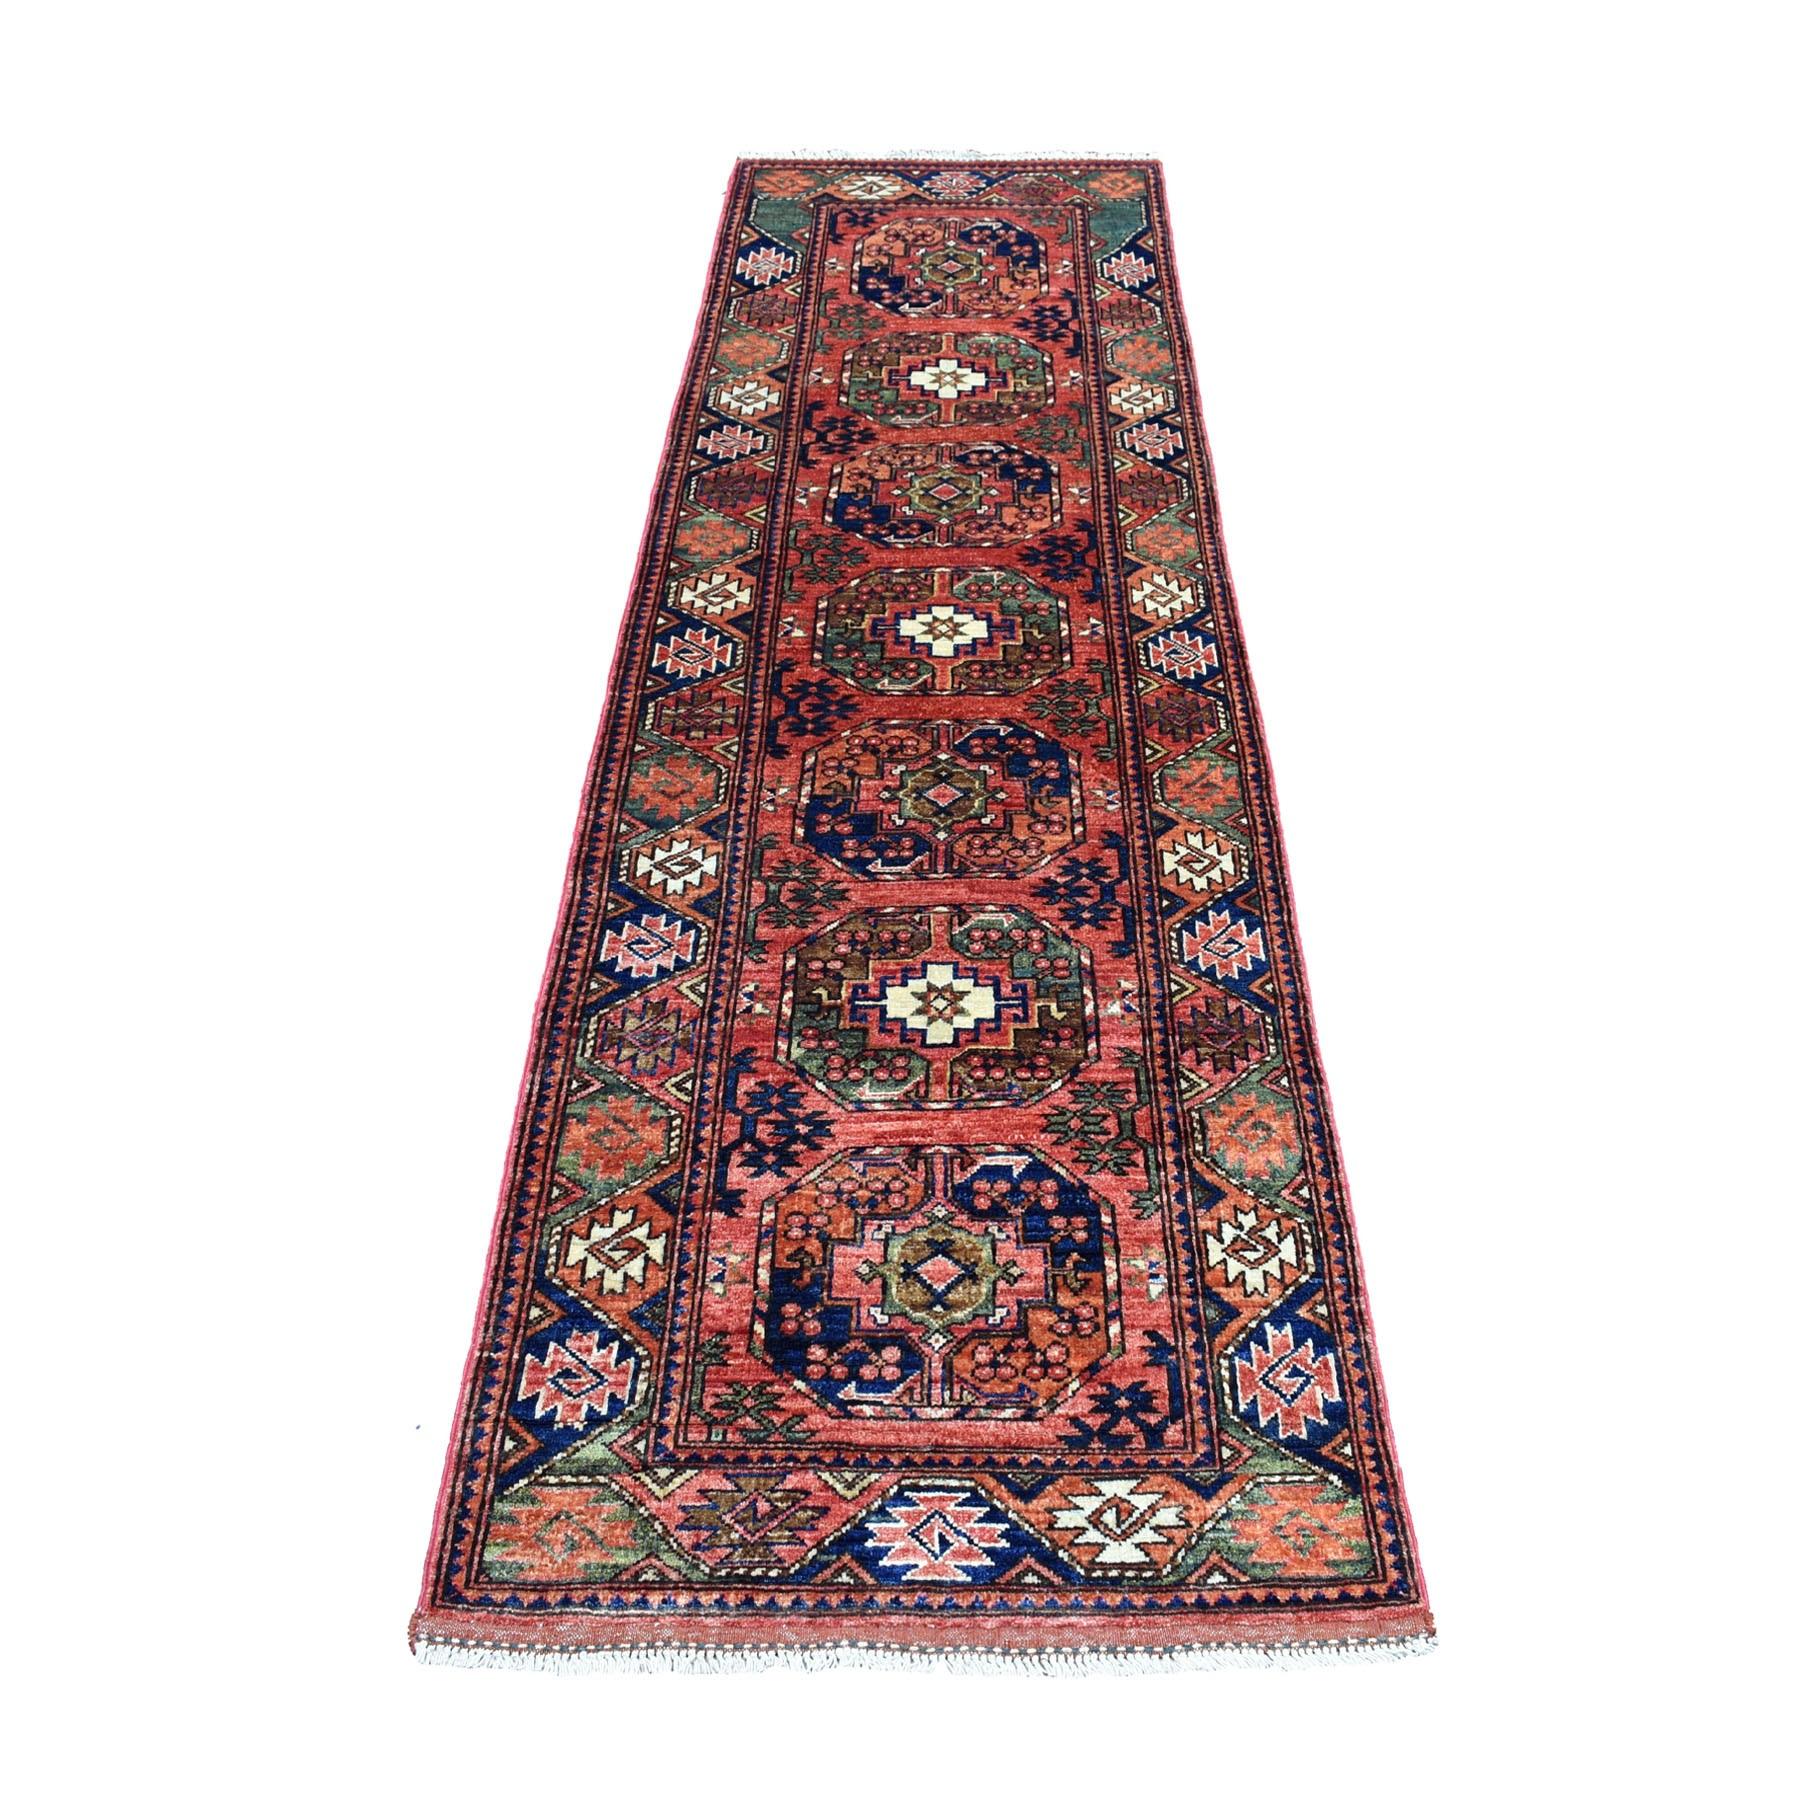 "2'8""X9'6"" Red Afghan Ersari Elephant Feet Design Pure Wool Hand Knotted Oriental Rug moaec008"